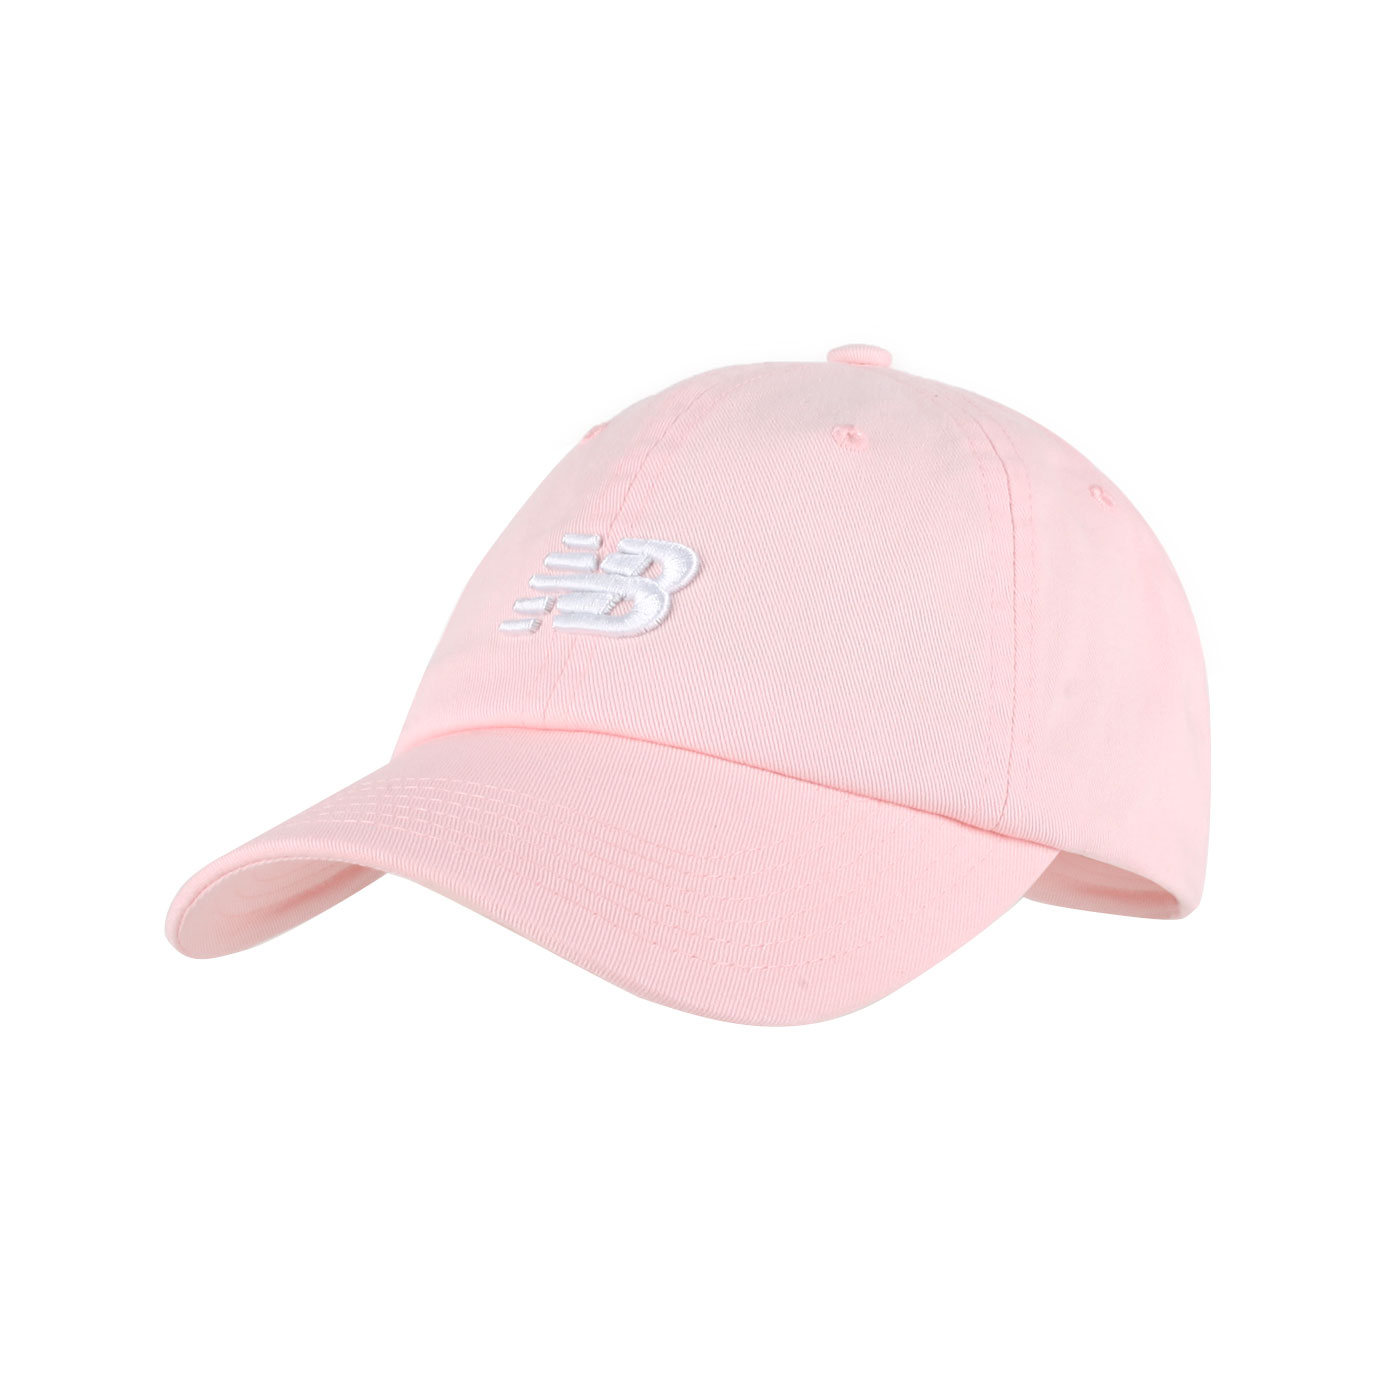 NEW BALANCE 棒球帽 LAH91014BK - 粉白